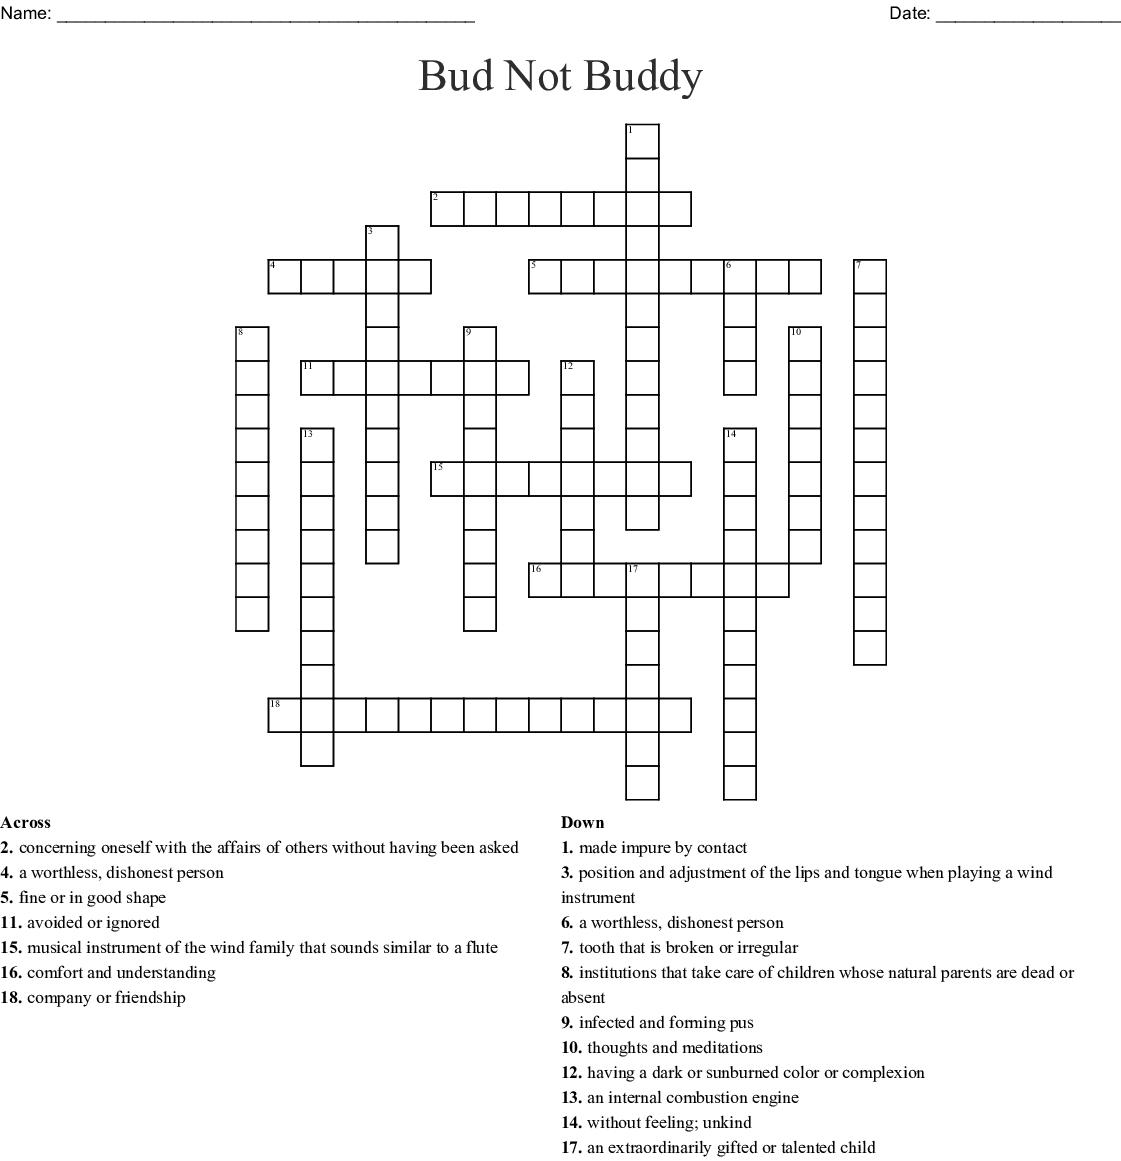 Bud Not Buddy Vocab Crossword